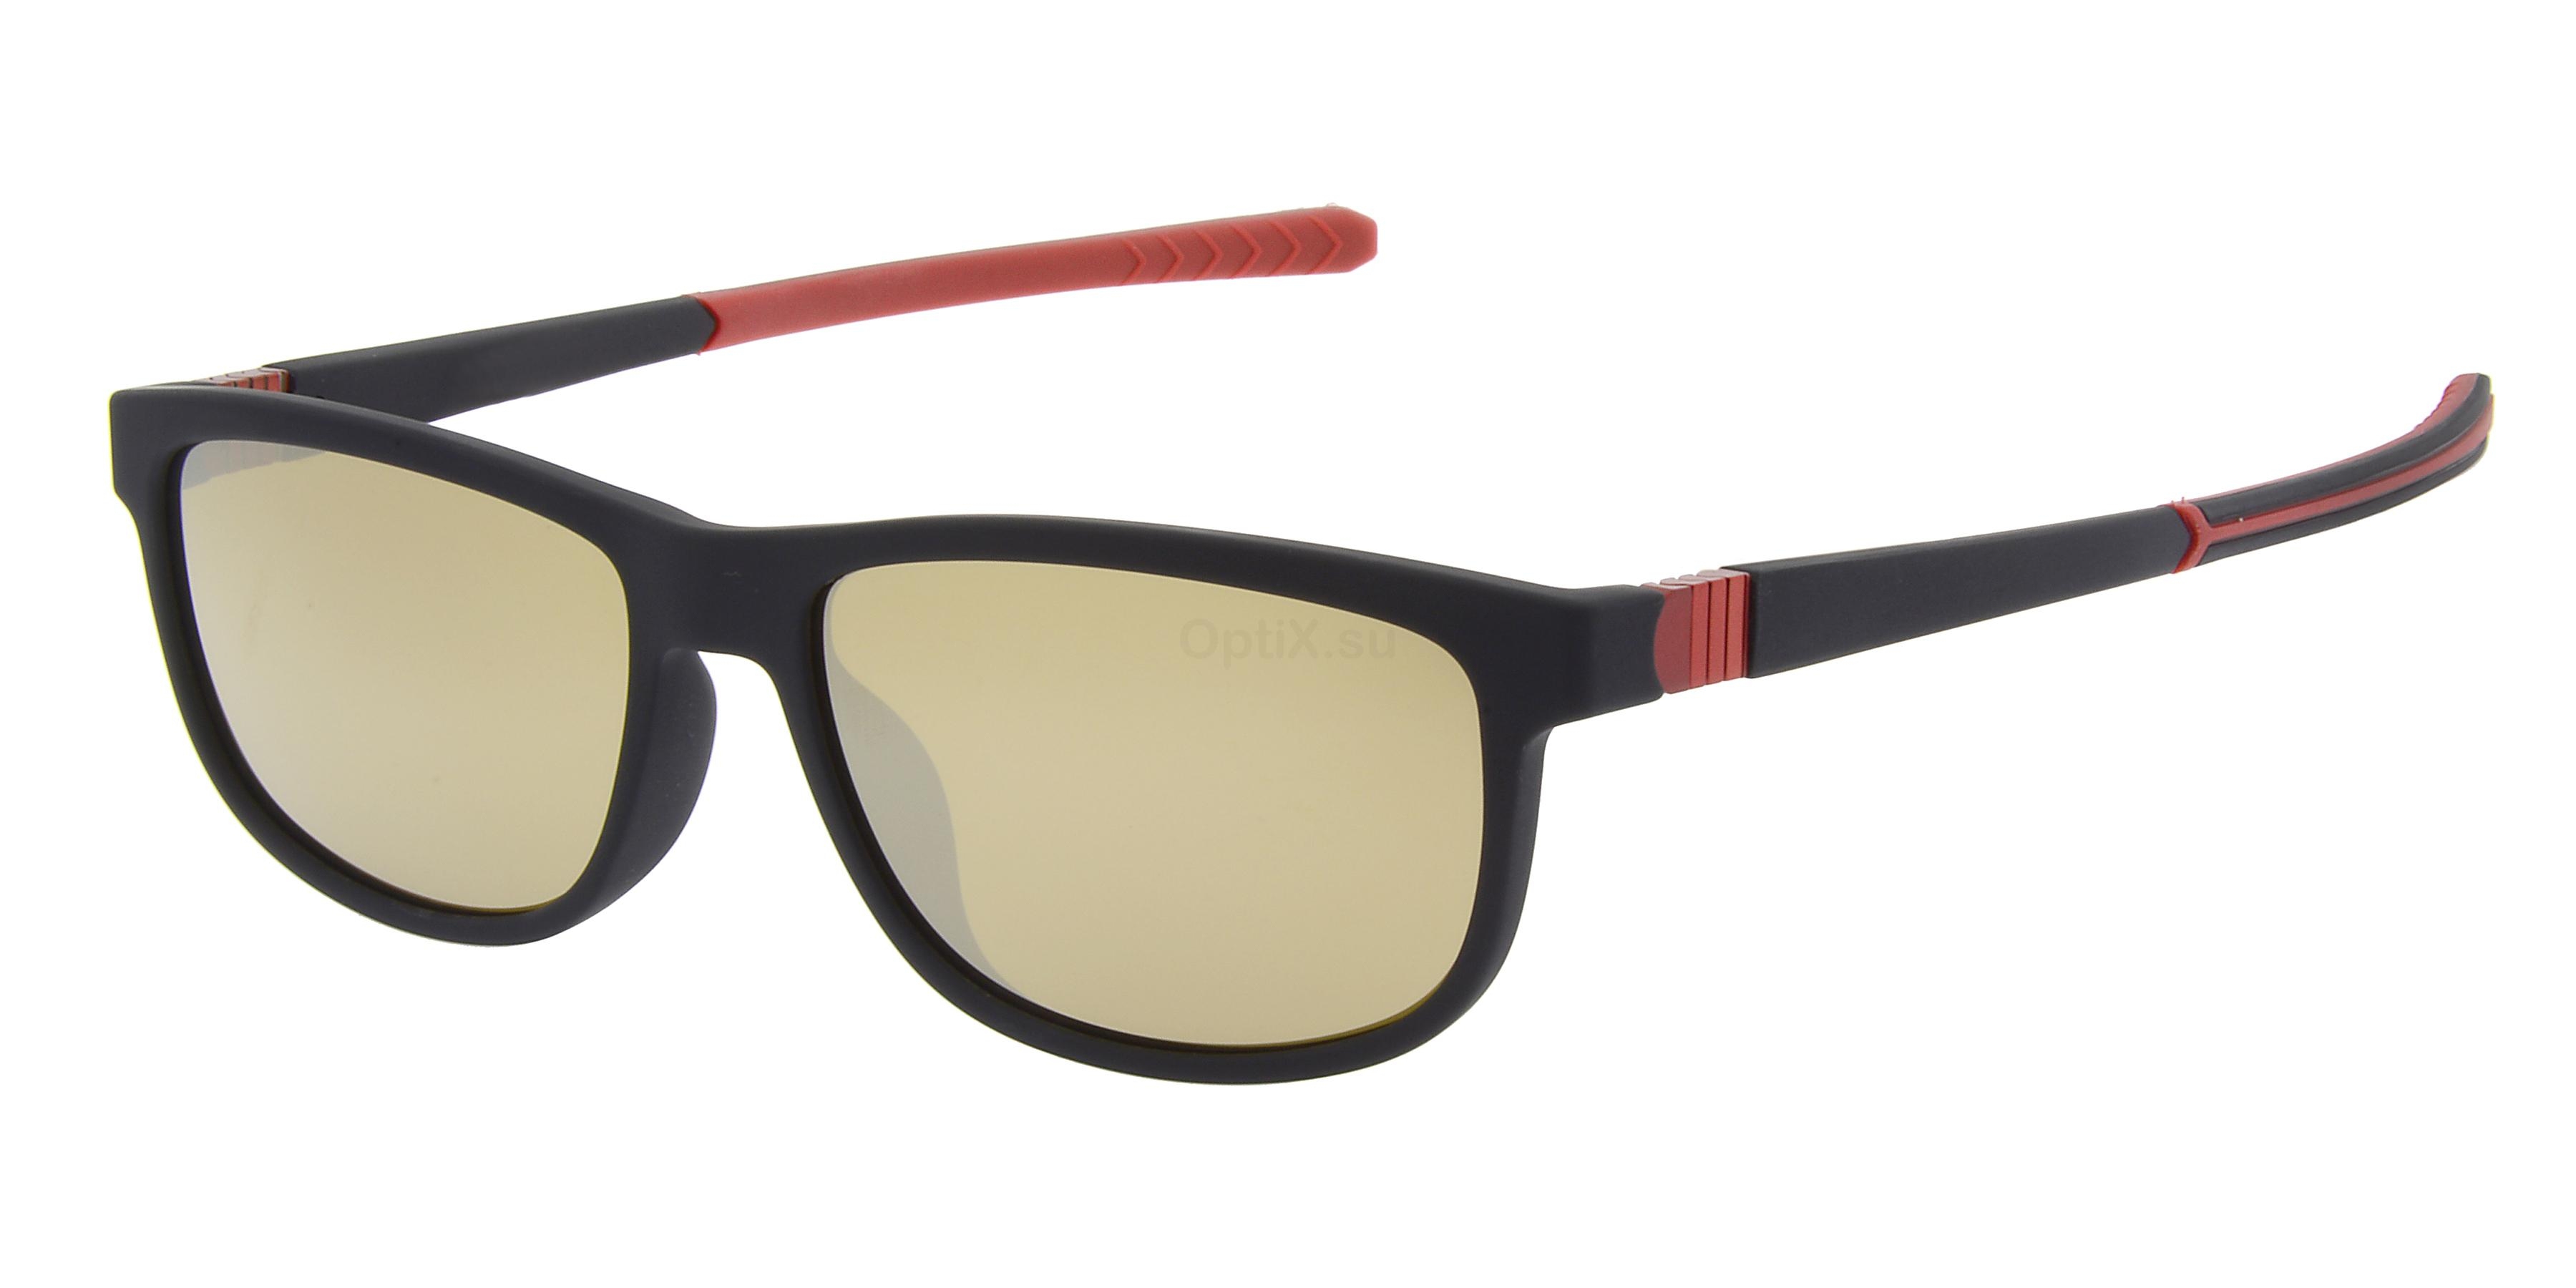 085P SP3014 Sunglasses, Spine